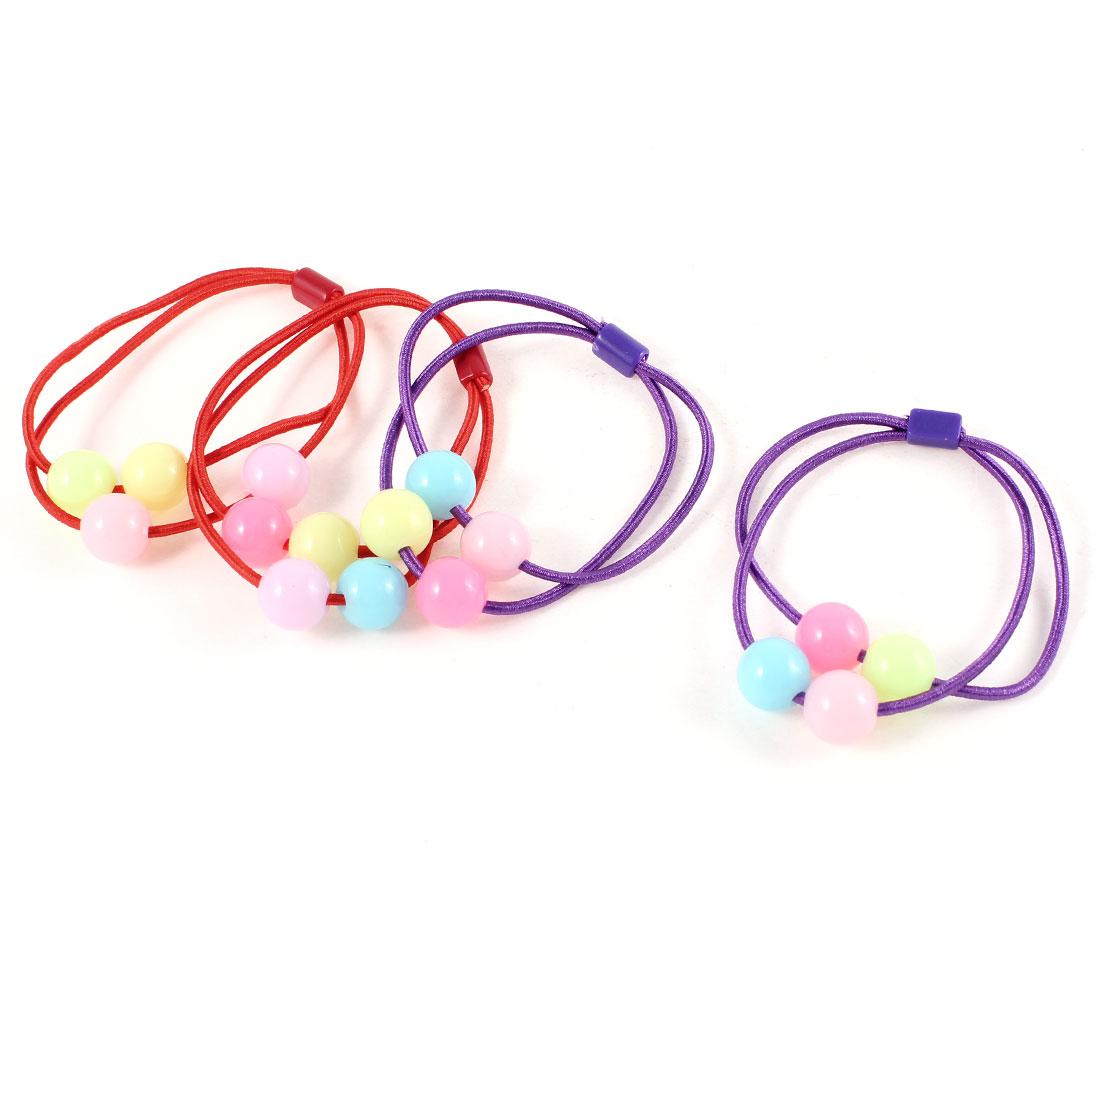 Multicolor Plastic Beads Detail Elastic Ponytail Holder Hair Tie Purple Red 2 Pair